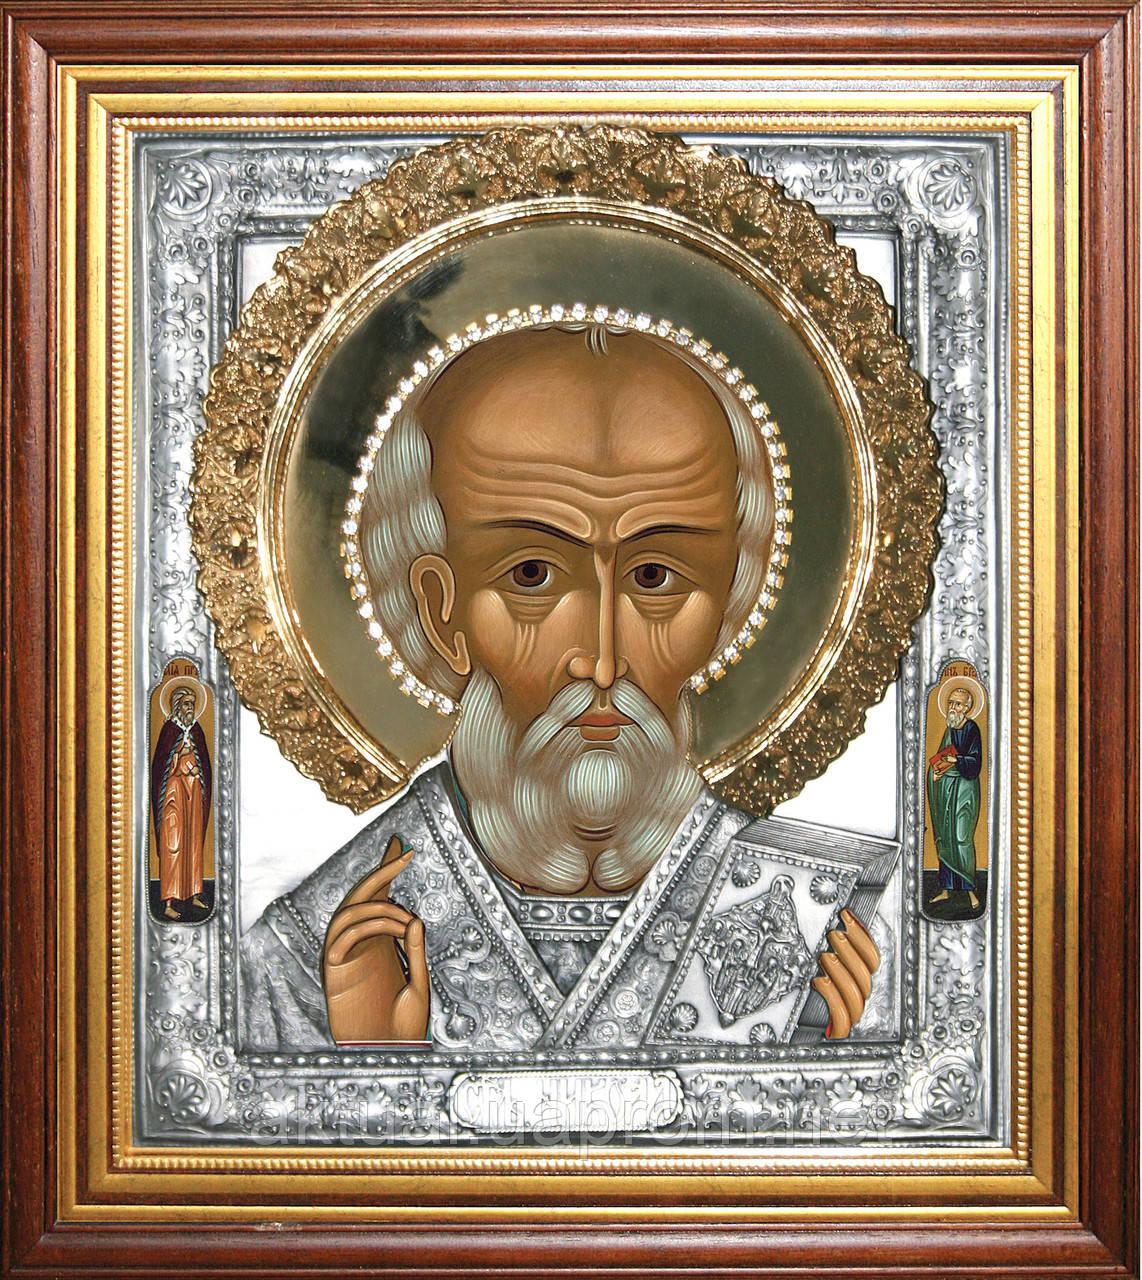 Икона Николай Чудотворец из серии триптих